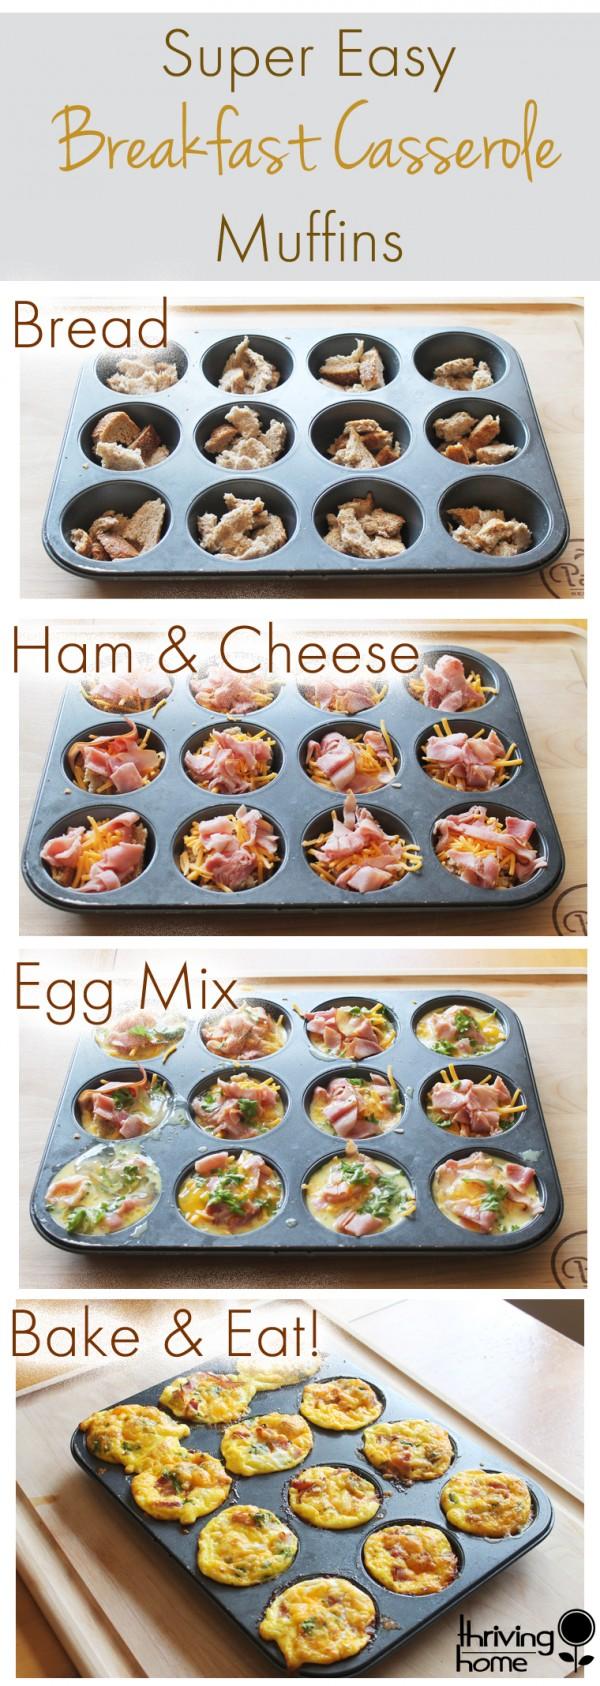 Get the recipe Breakfast Casserole Muffins @recipes_to_go